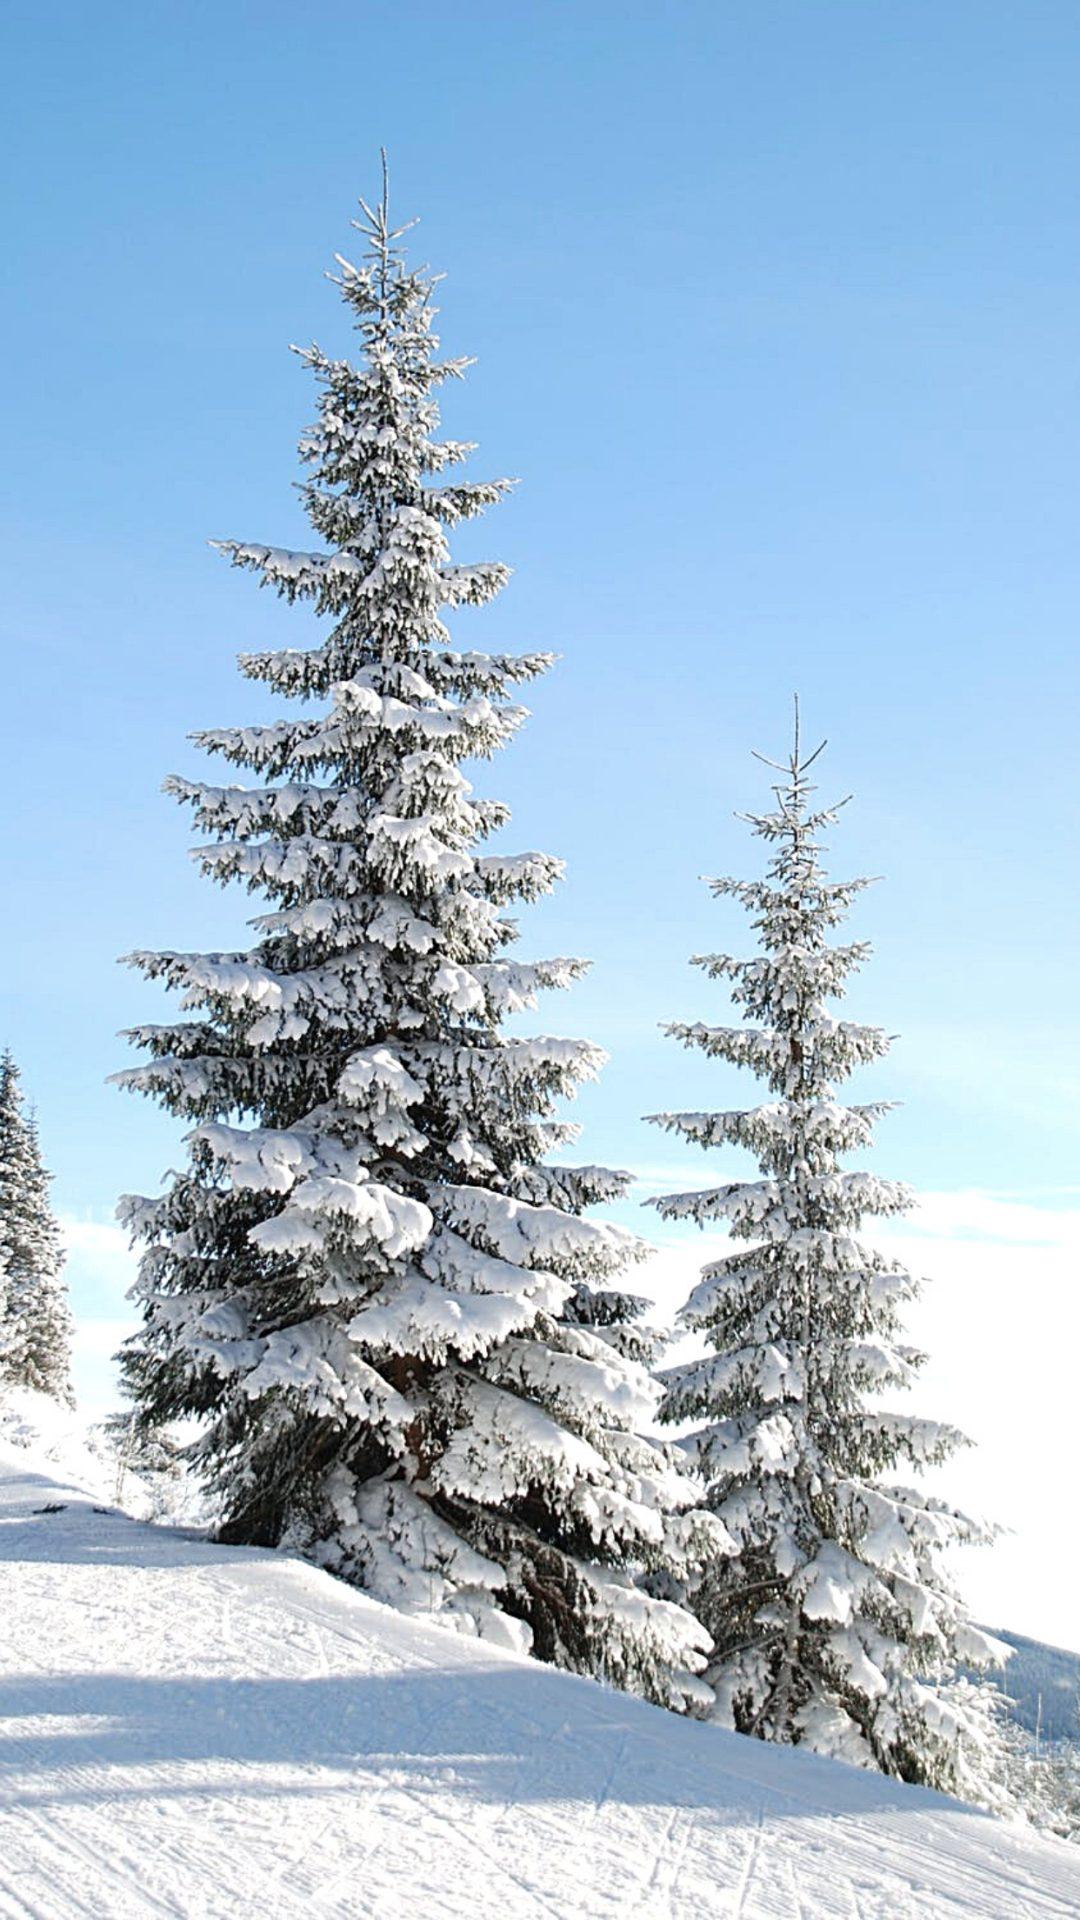 Winter forest iPhone wallpaper